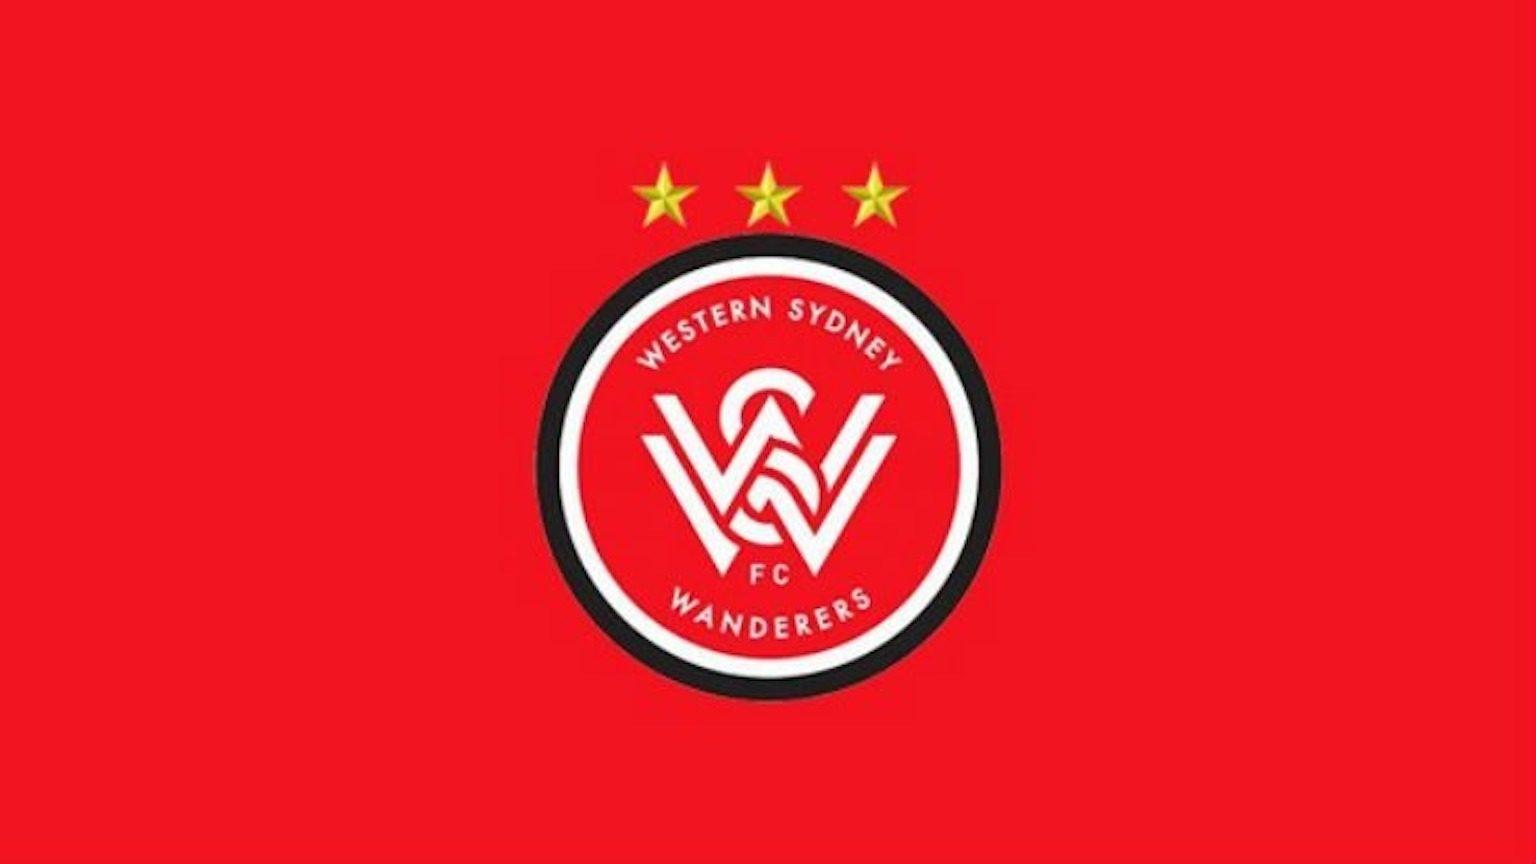 Western Sydney Wanderers: